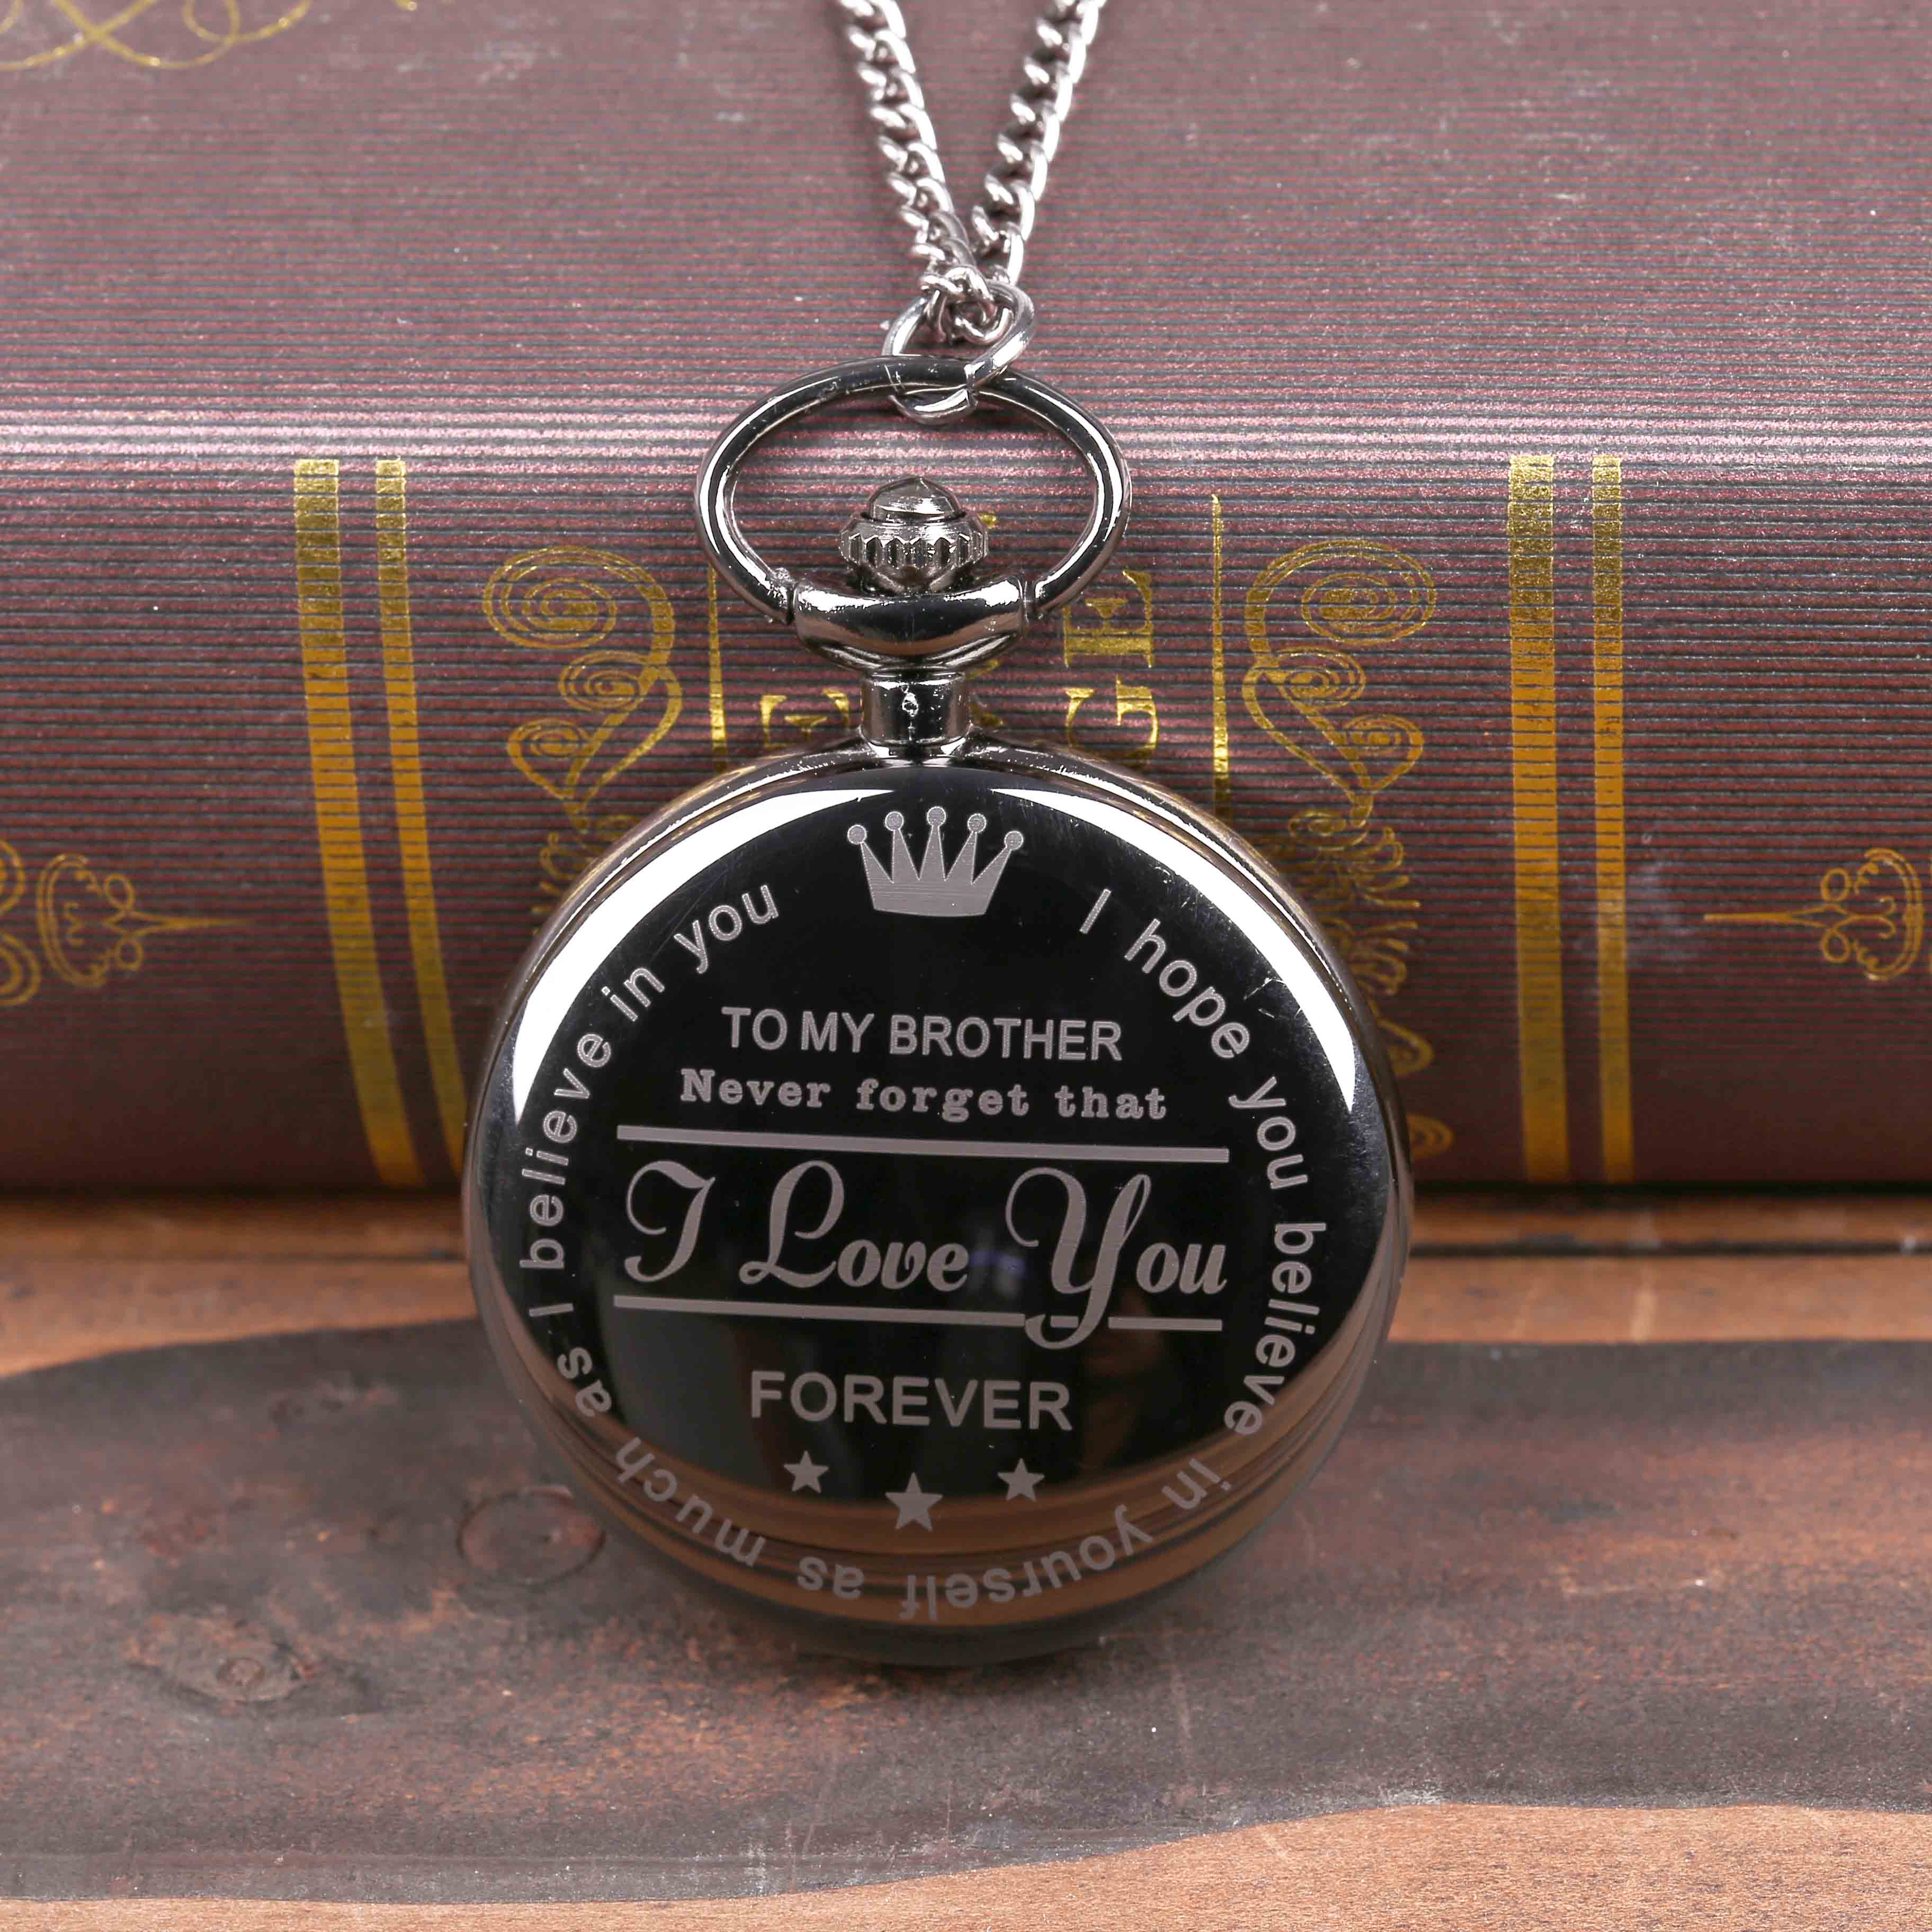 FOT Pocket Watch Personalized Pattern Steampunk Retro Vintage Quartz Roman Numerals Pocket Watch 'TO MY Brother' Boys Watch Gift